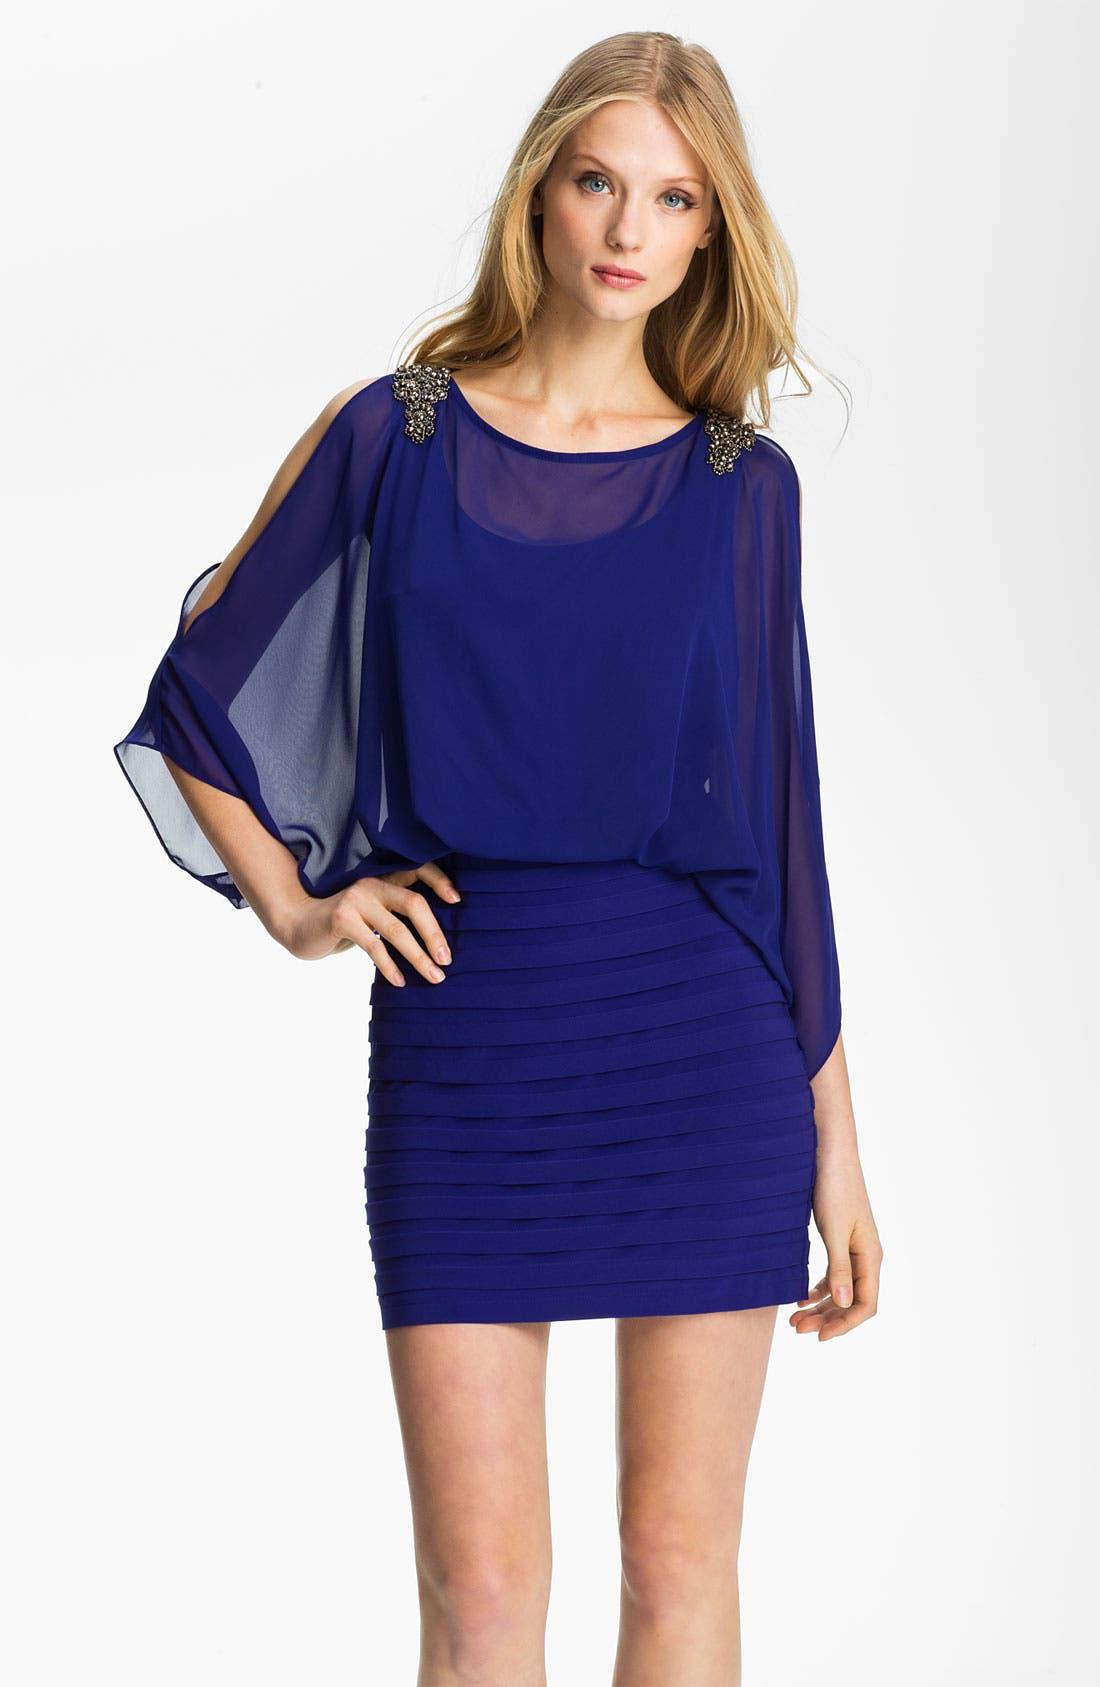 Alternate Image 1 Selected - Xscape Embellished Shoulder Chiffon & Jersey Blouson Dress